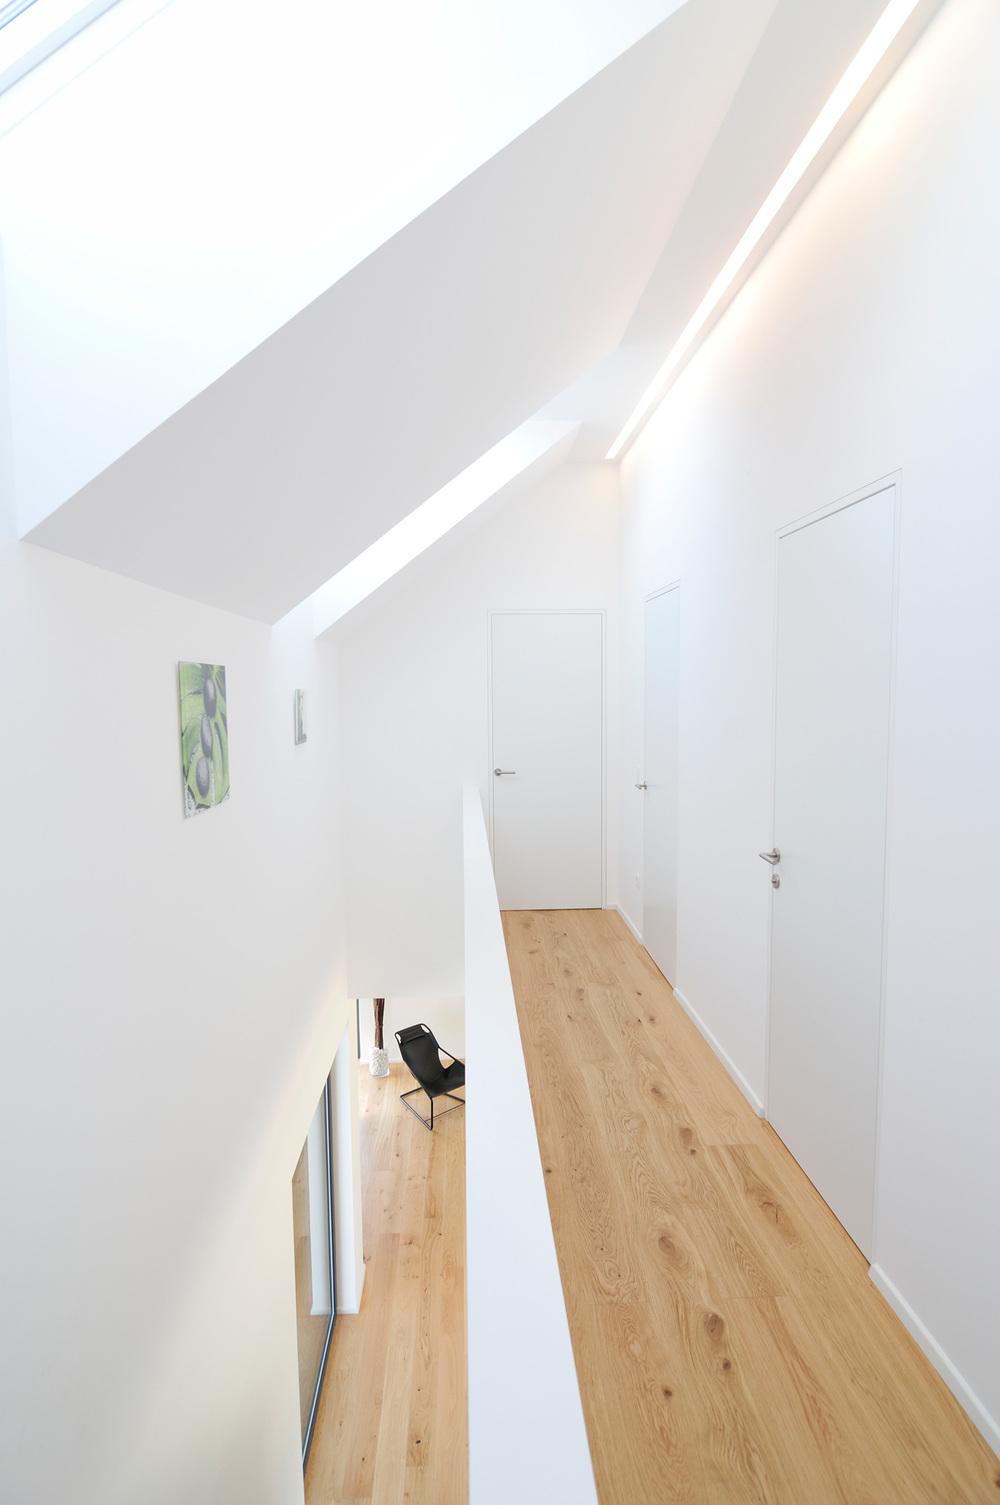 Notranjost aktivne hiše Lumar - hodnik